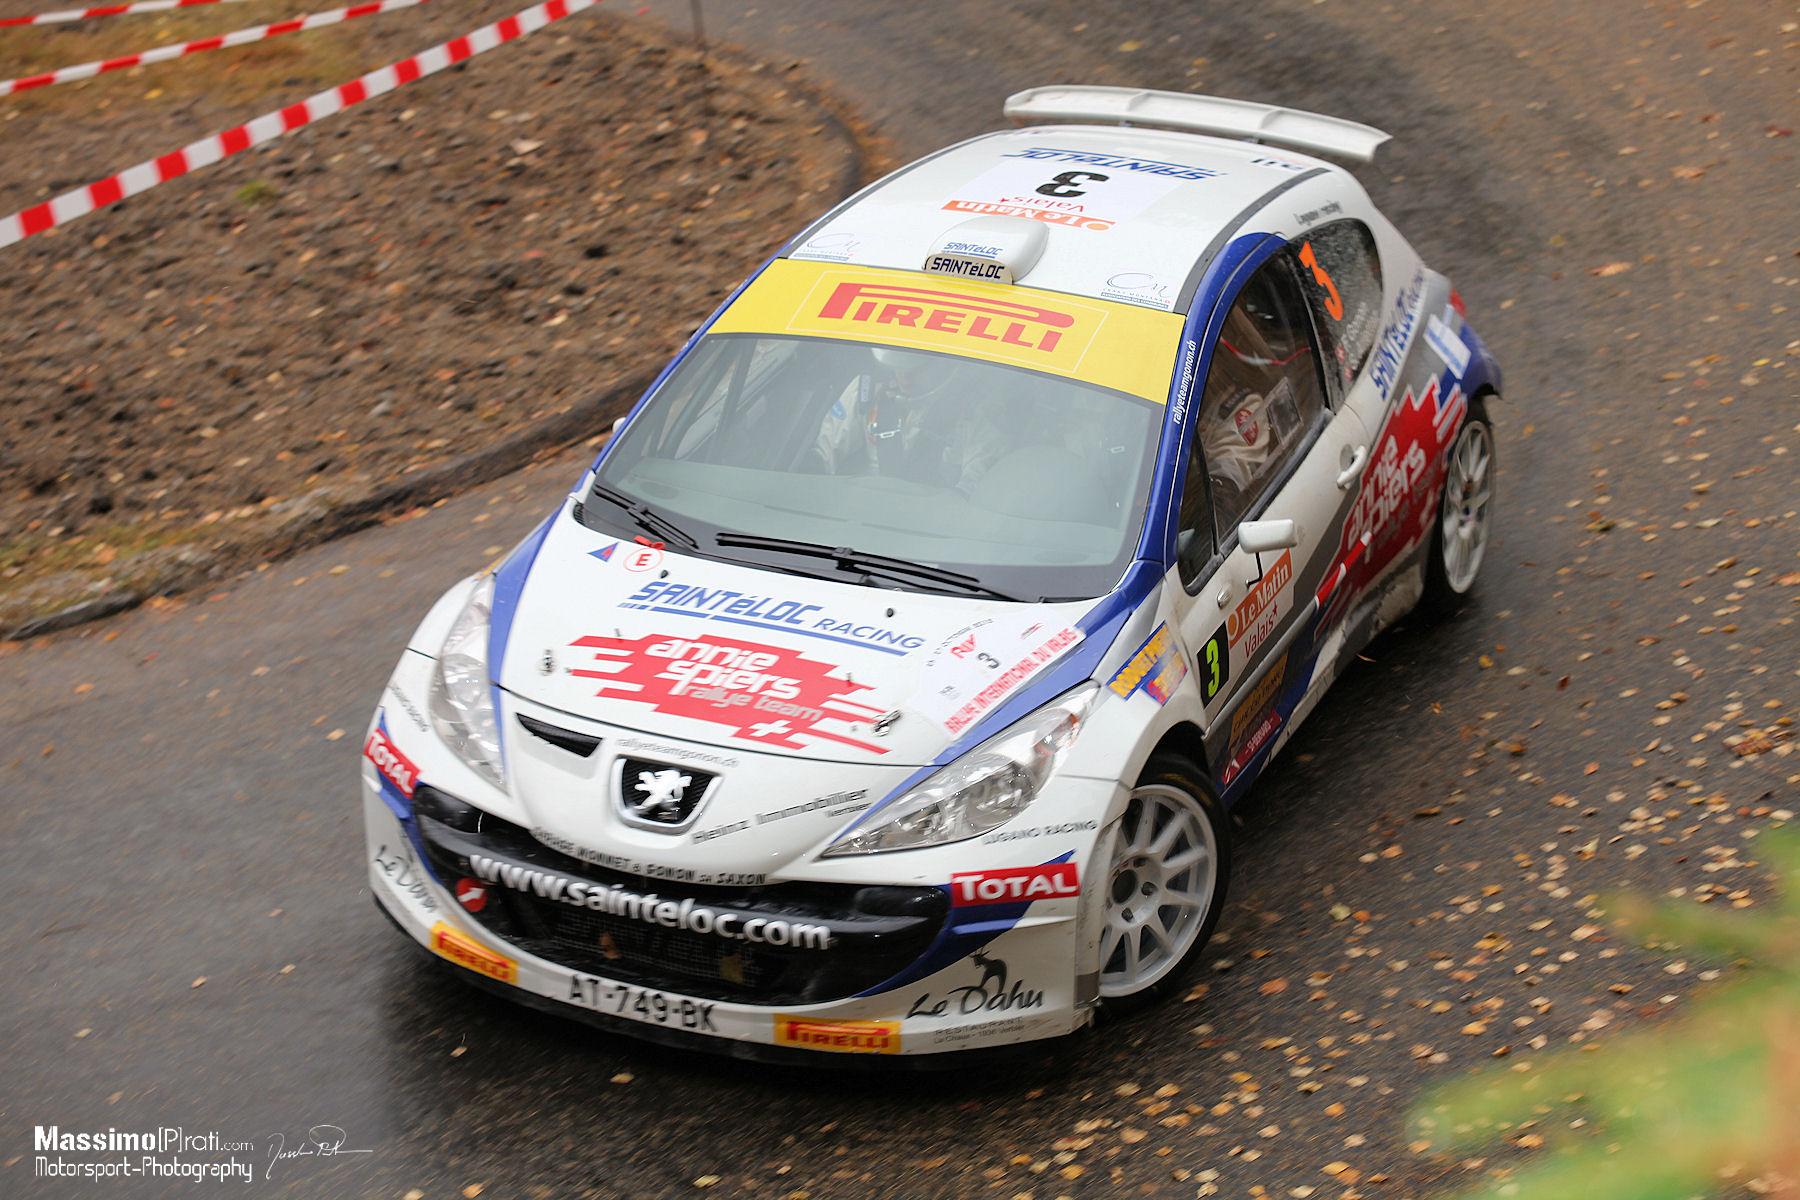 2e : Gonon Florian - Arlettaz Sandra (Peugeot 207 S2000)